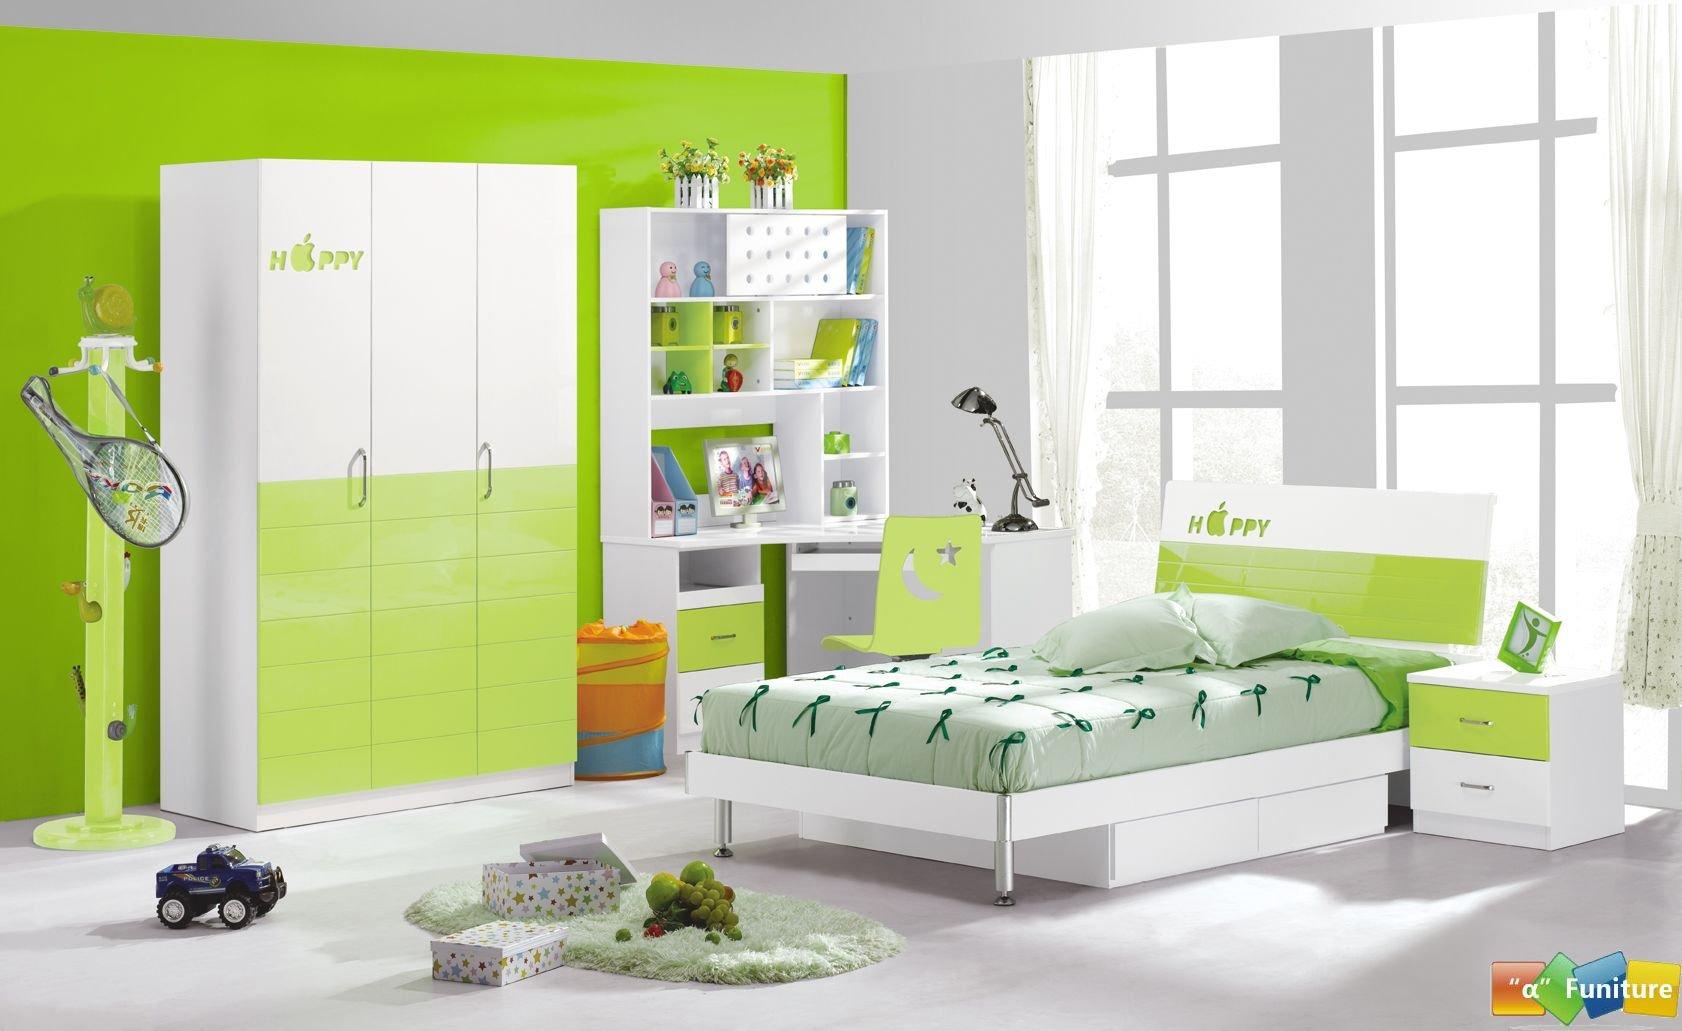 4 Pcs New Full Size Bedroom Set MDF Panels Children Furniture,Bookcase ,Bed, Nightstand ,Wardrobe(China (Mainland))